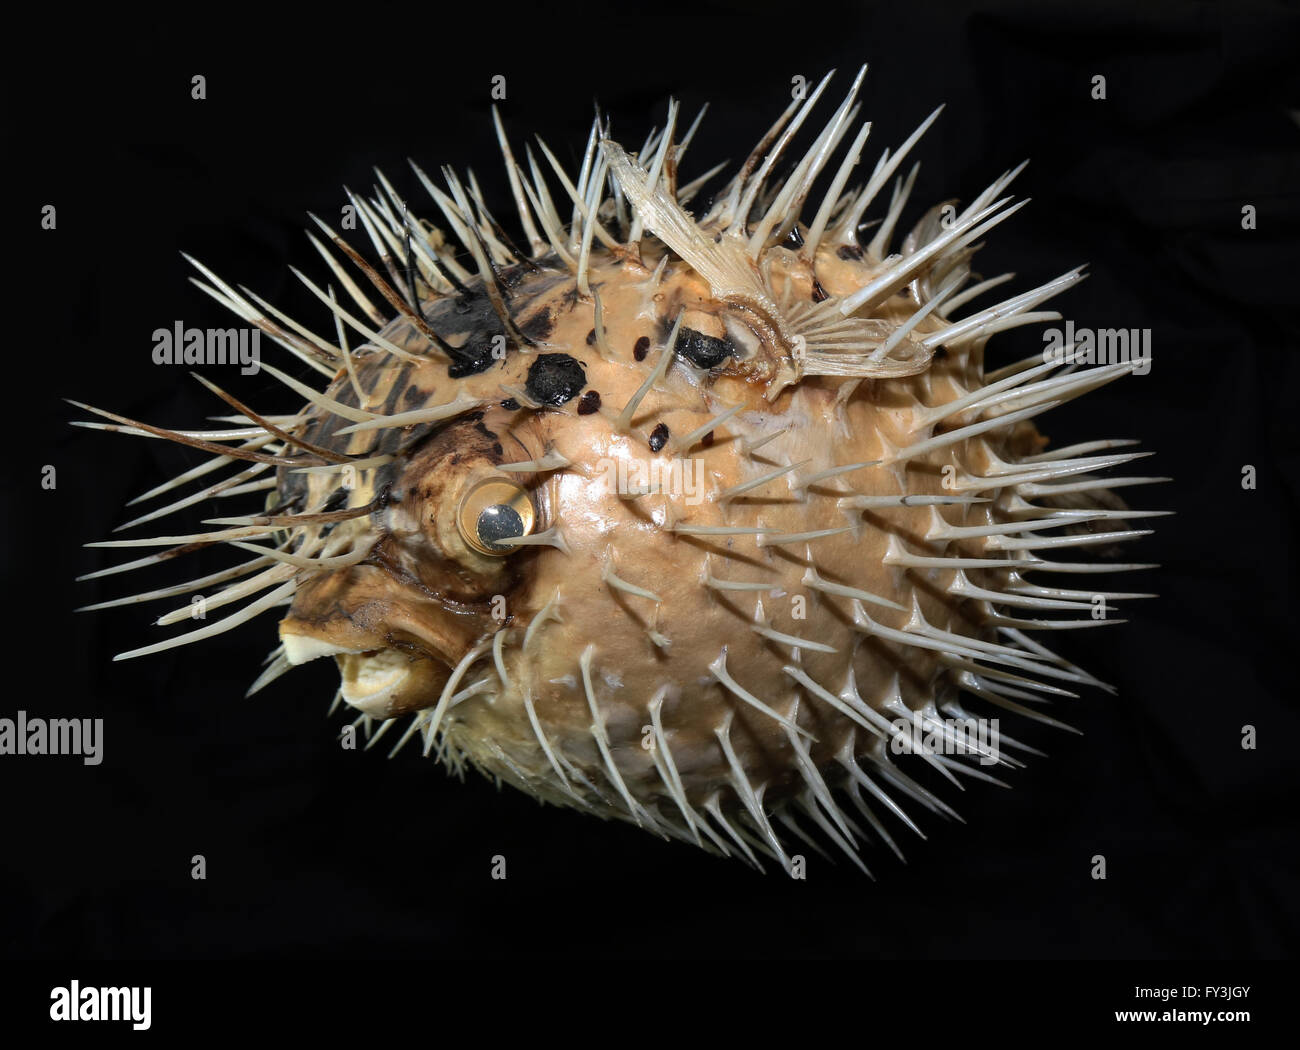 Puffer Fish on Black Background Stock Photo: 102727995 - Alamy